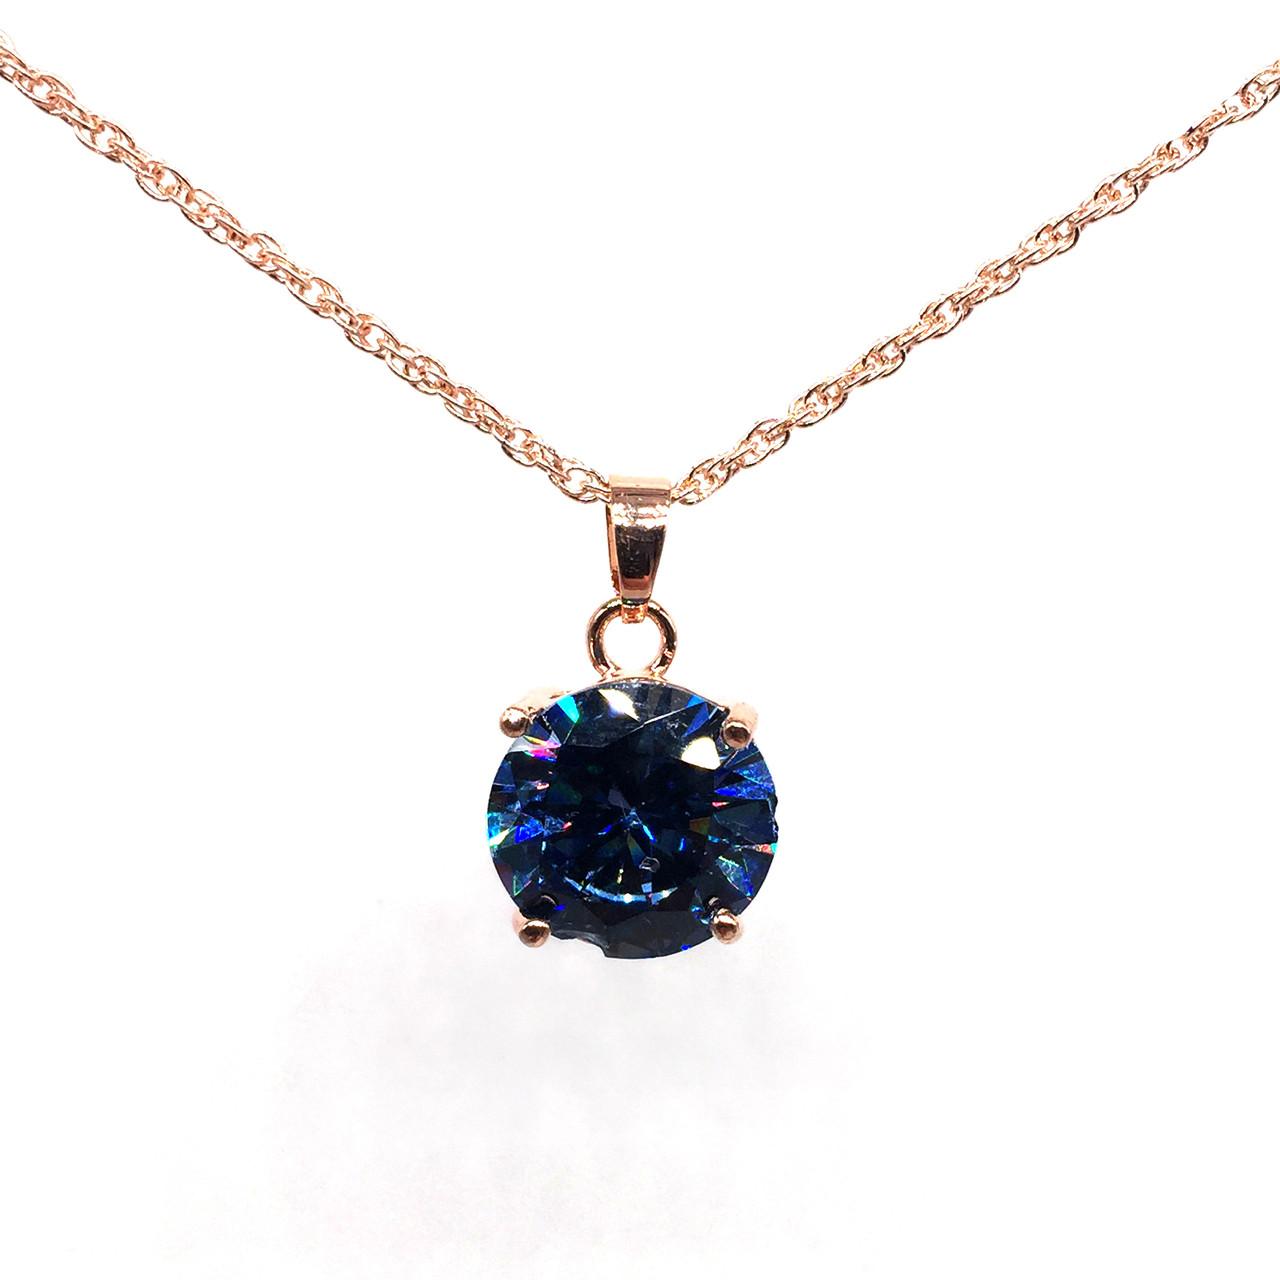 Подвеска на цепочке SONATA из медицинского золота, синий фианит, позолота PO, 41934       (1)